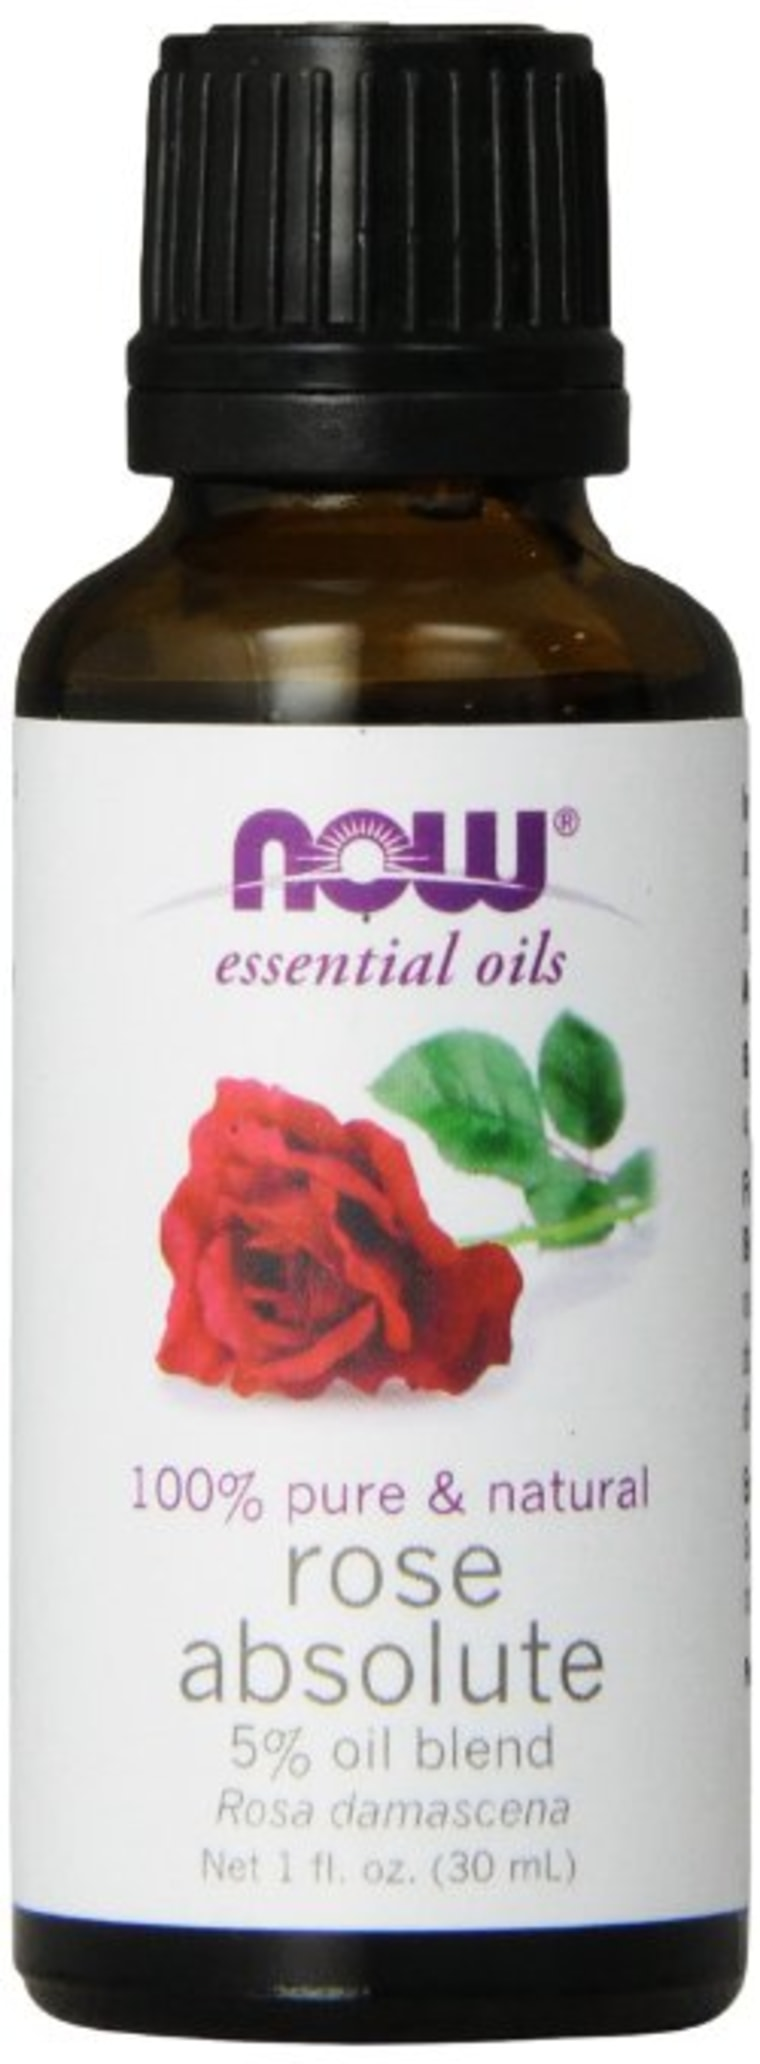 Now Rose Oil